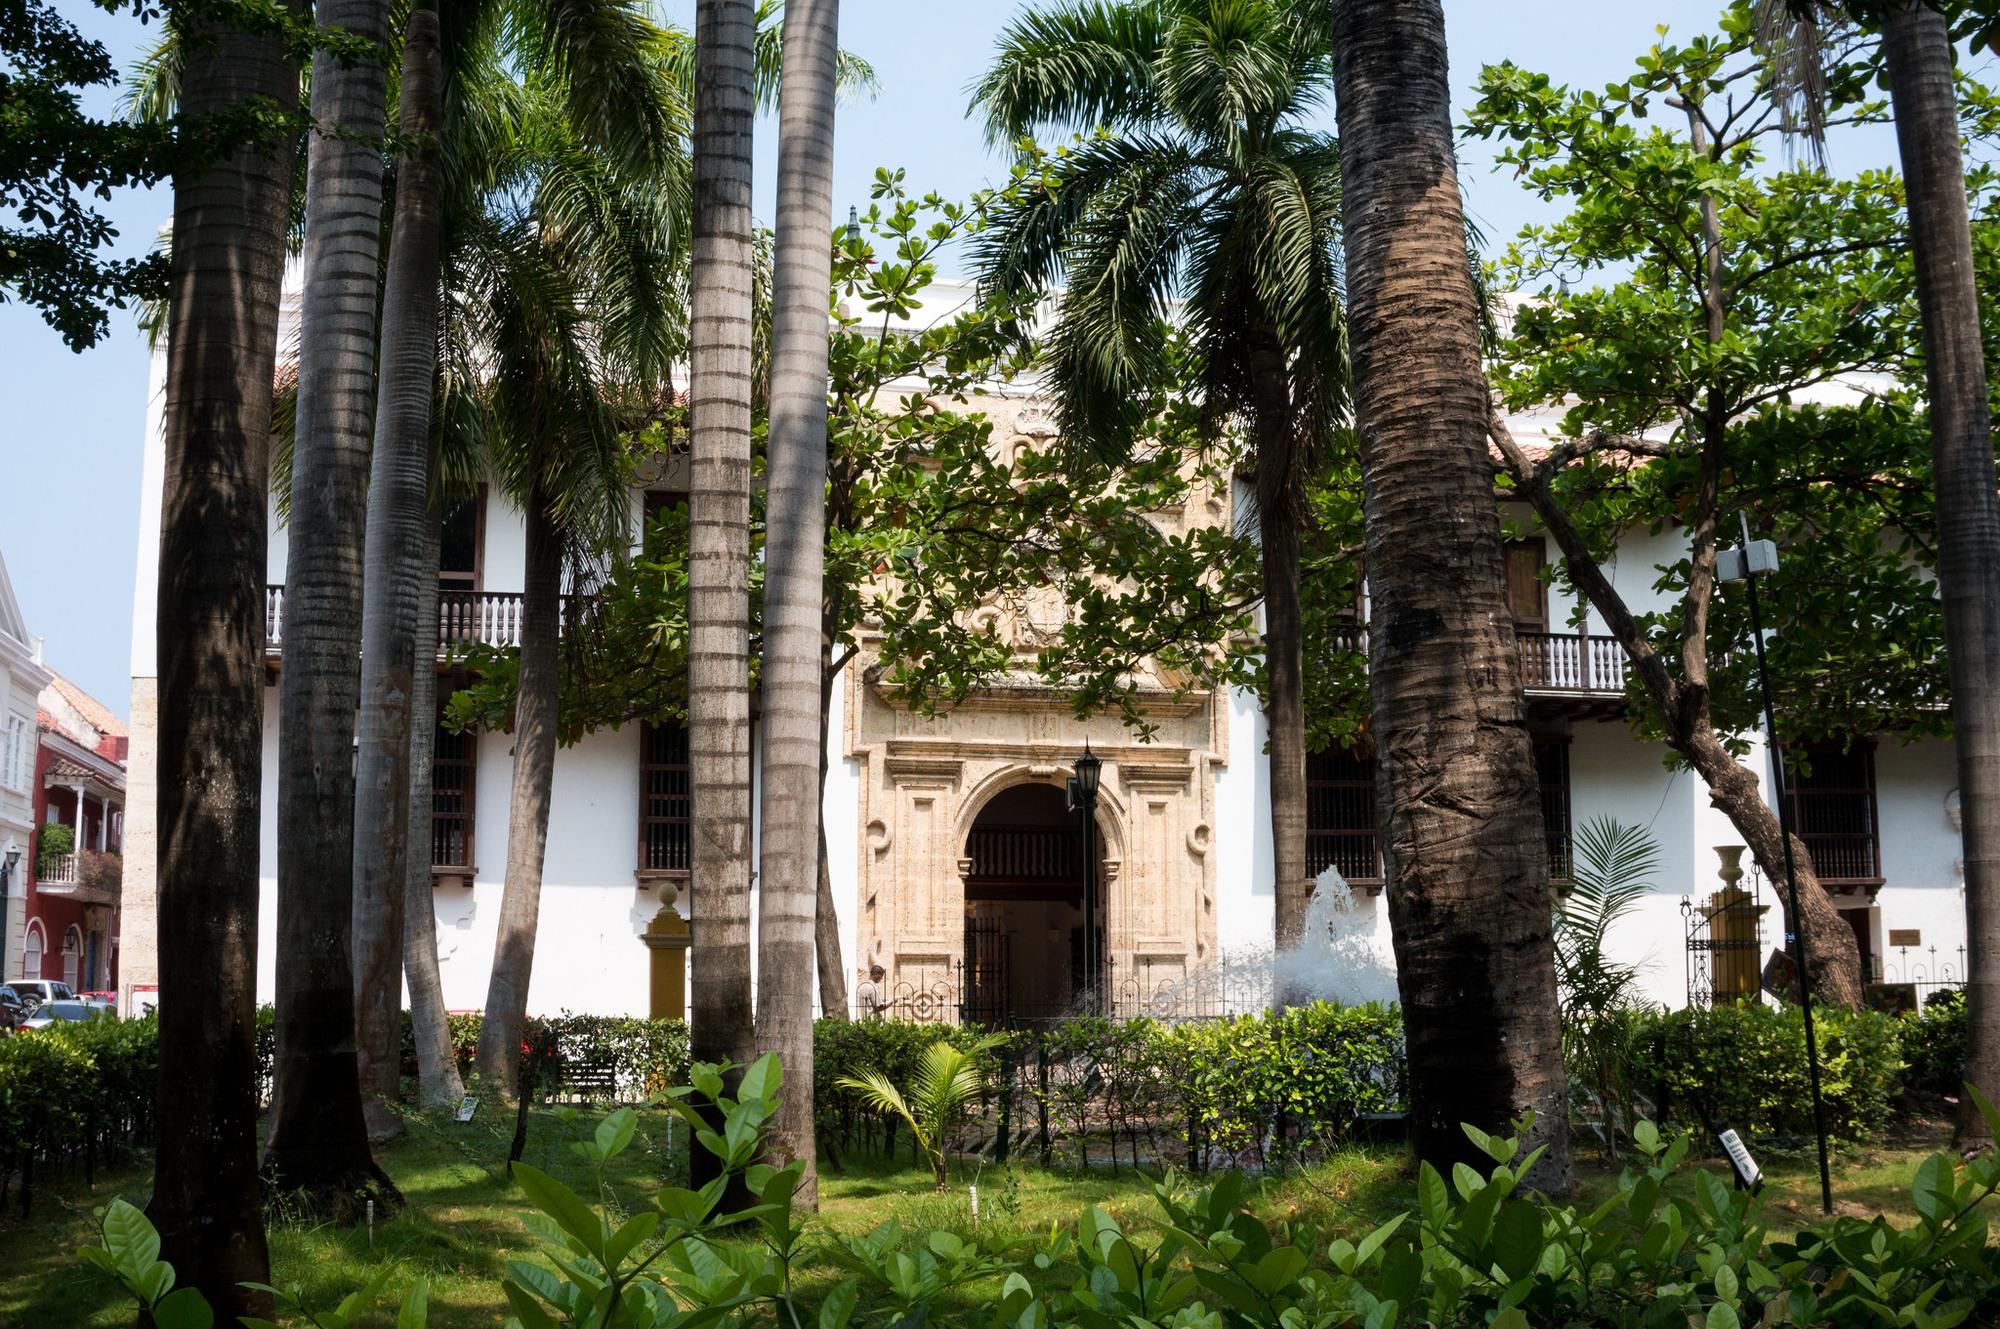 Galer a de gu a de arquitectura de cartagena 20 lugares - Arquitectura cartagena ...